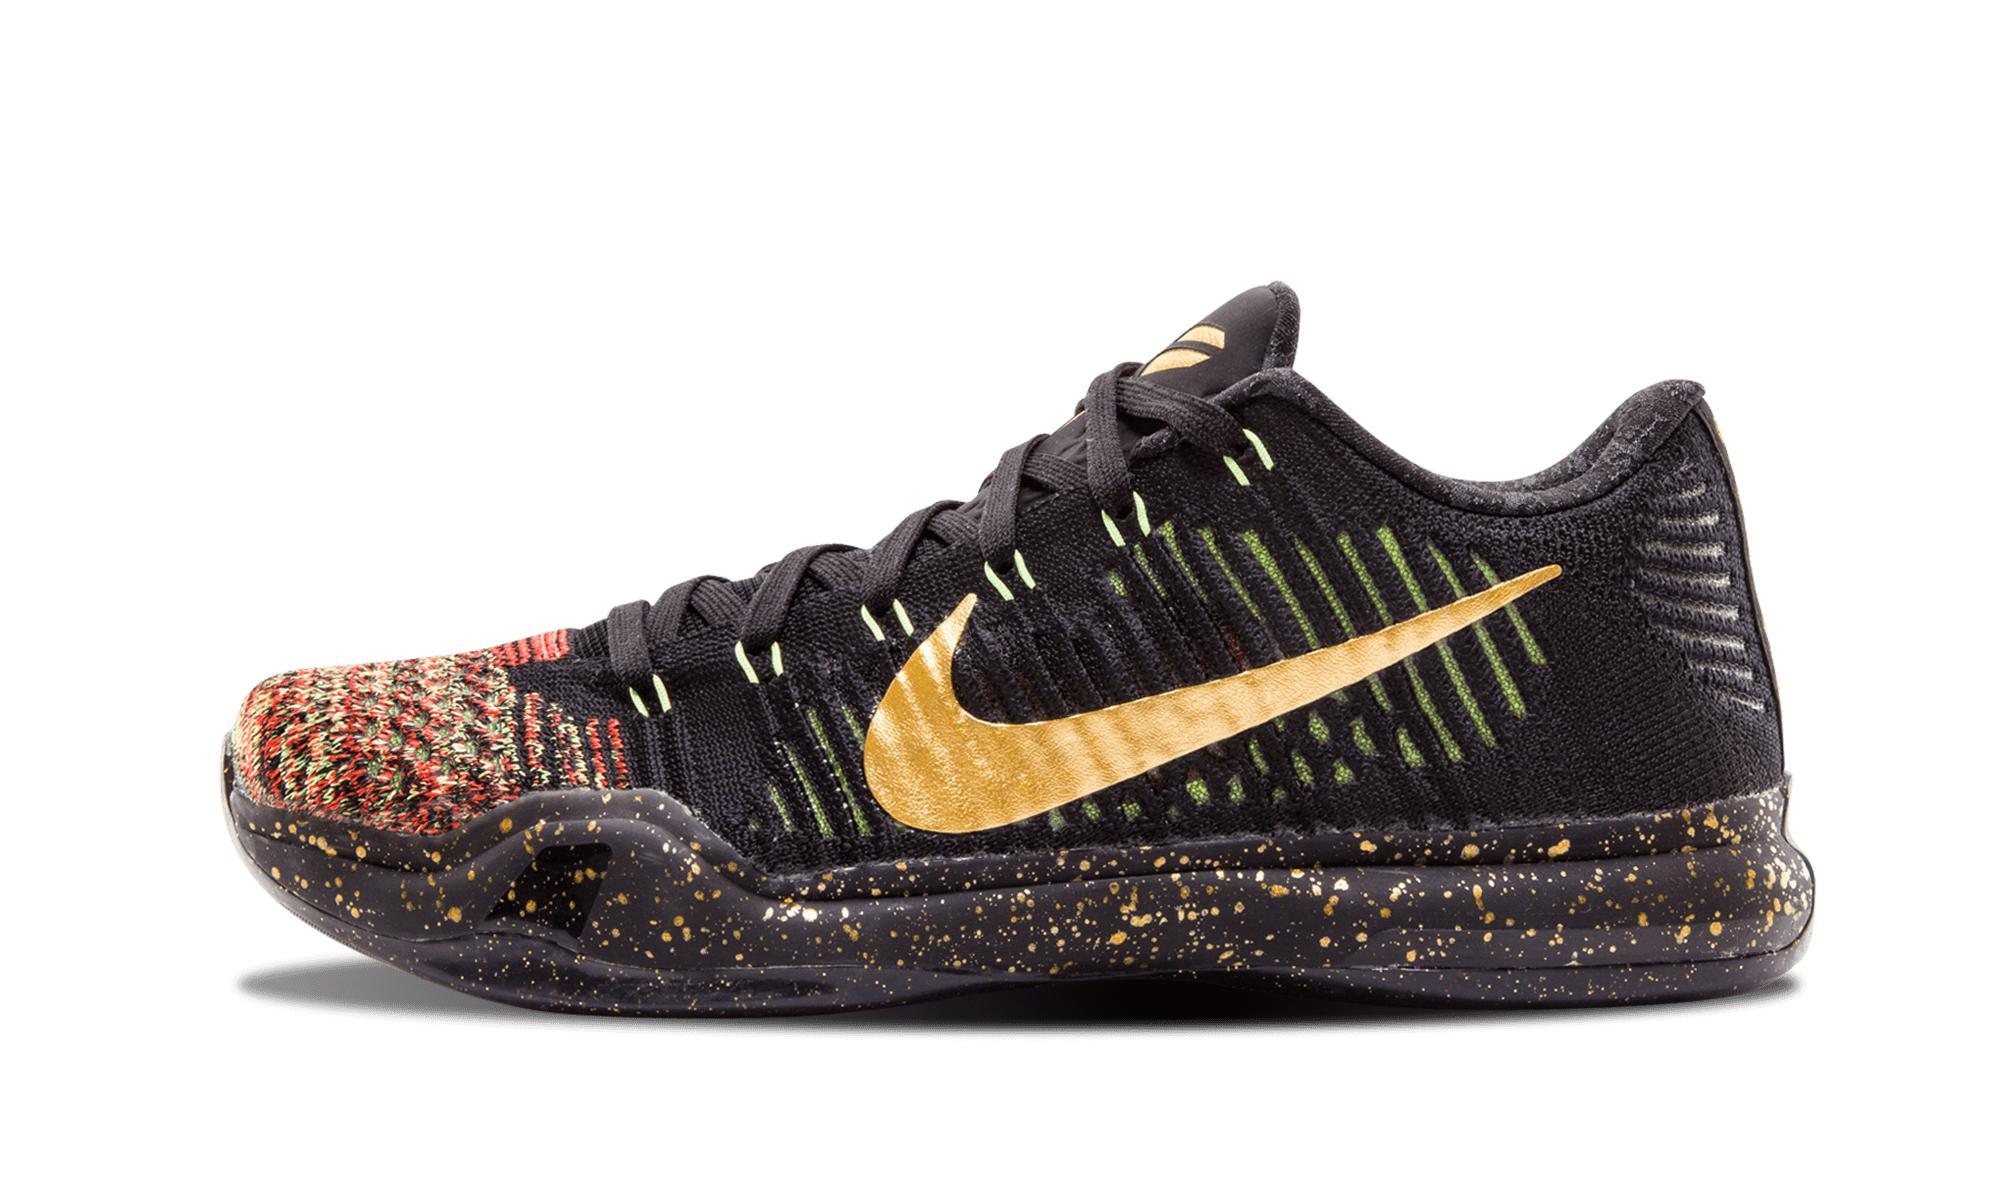 Lyst - Nike Kobe 10 Elite Low Xmas in Black for Men